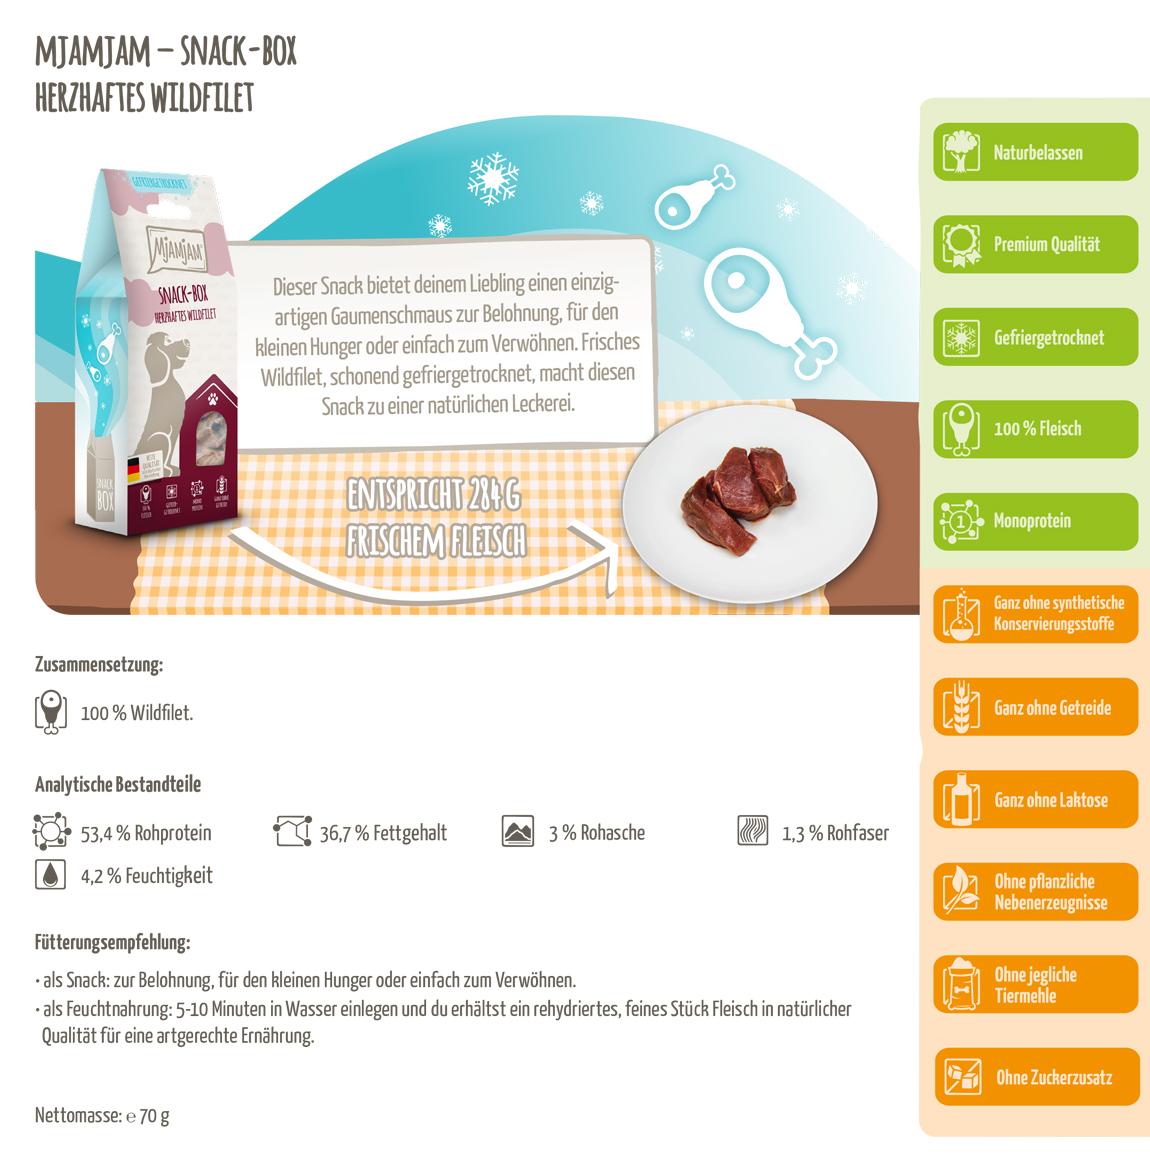 Produktdetails_Snack-BOX_Hund_Wildfilet